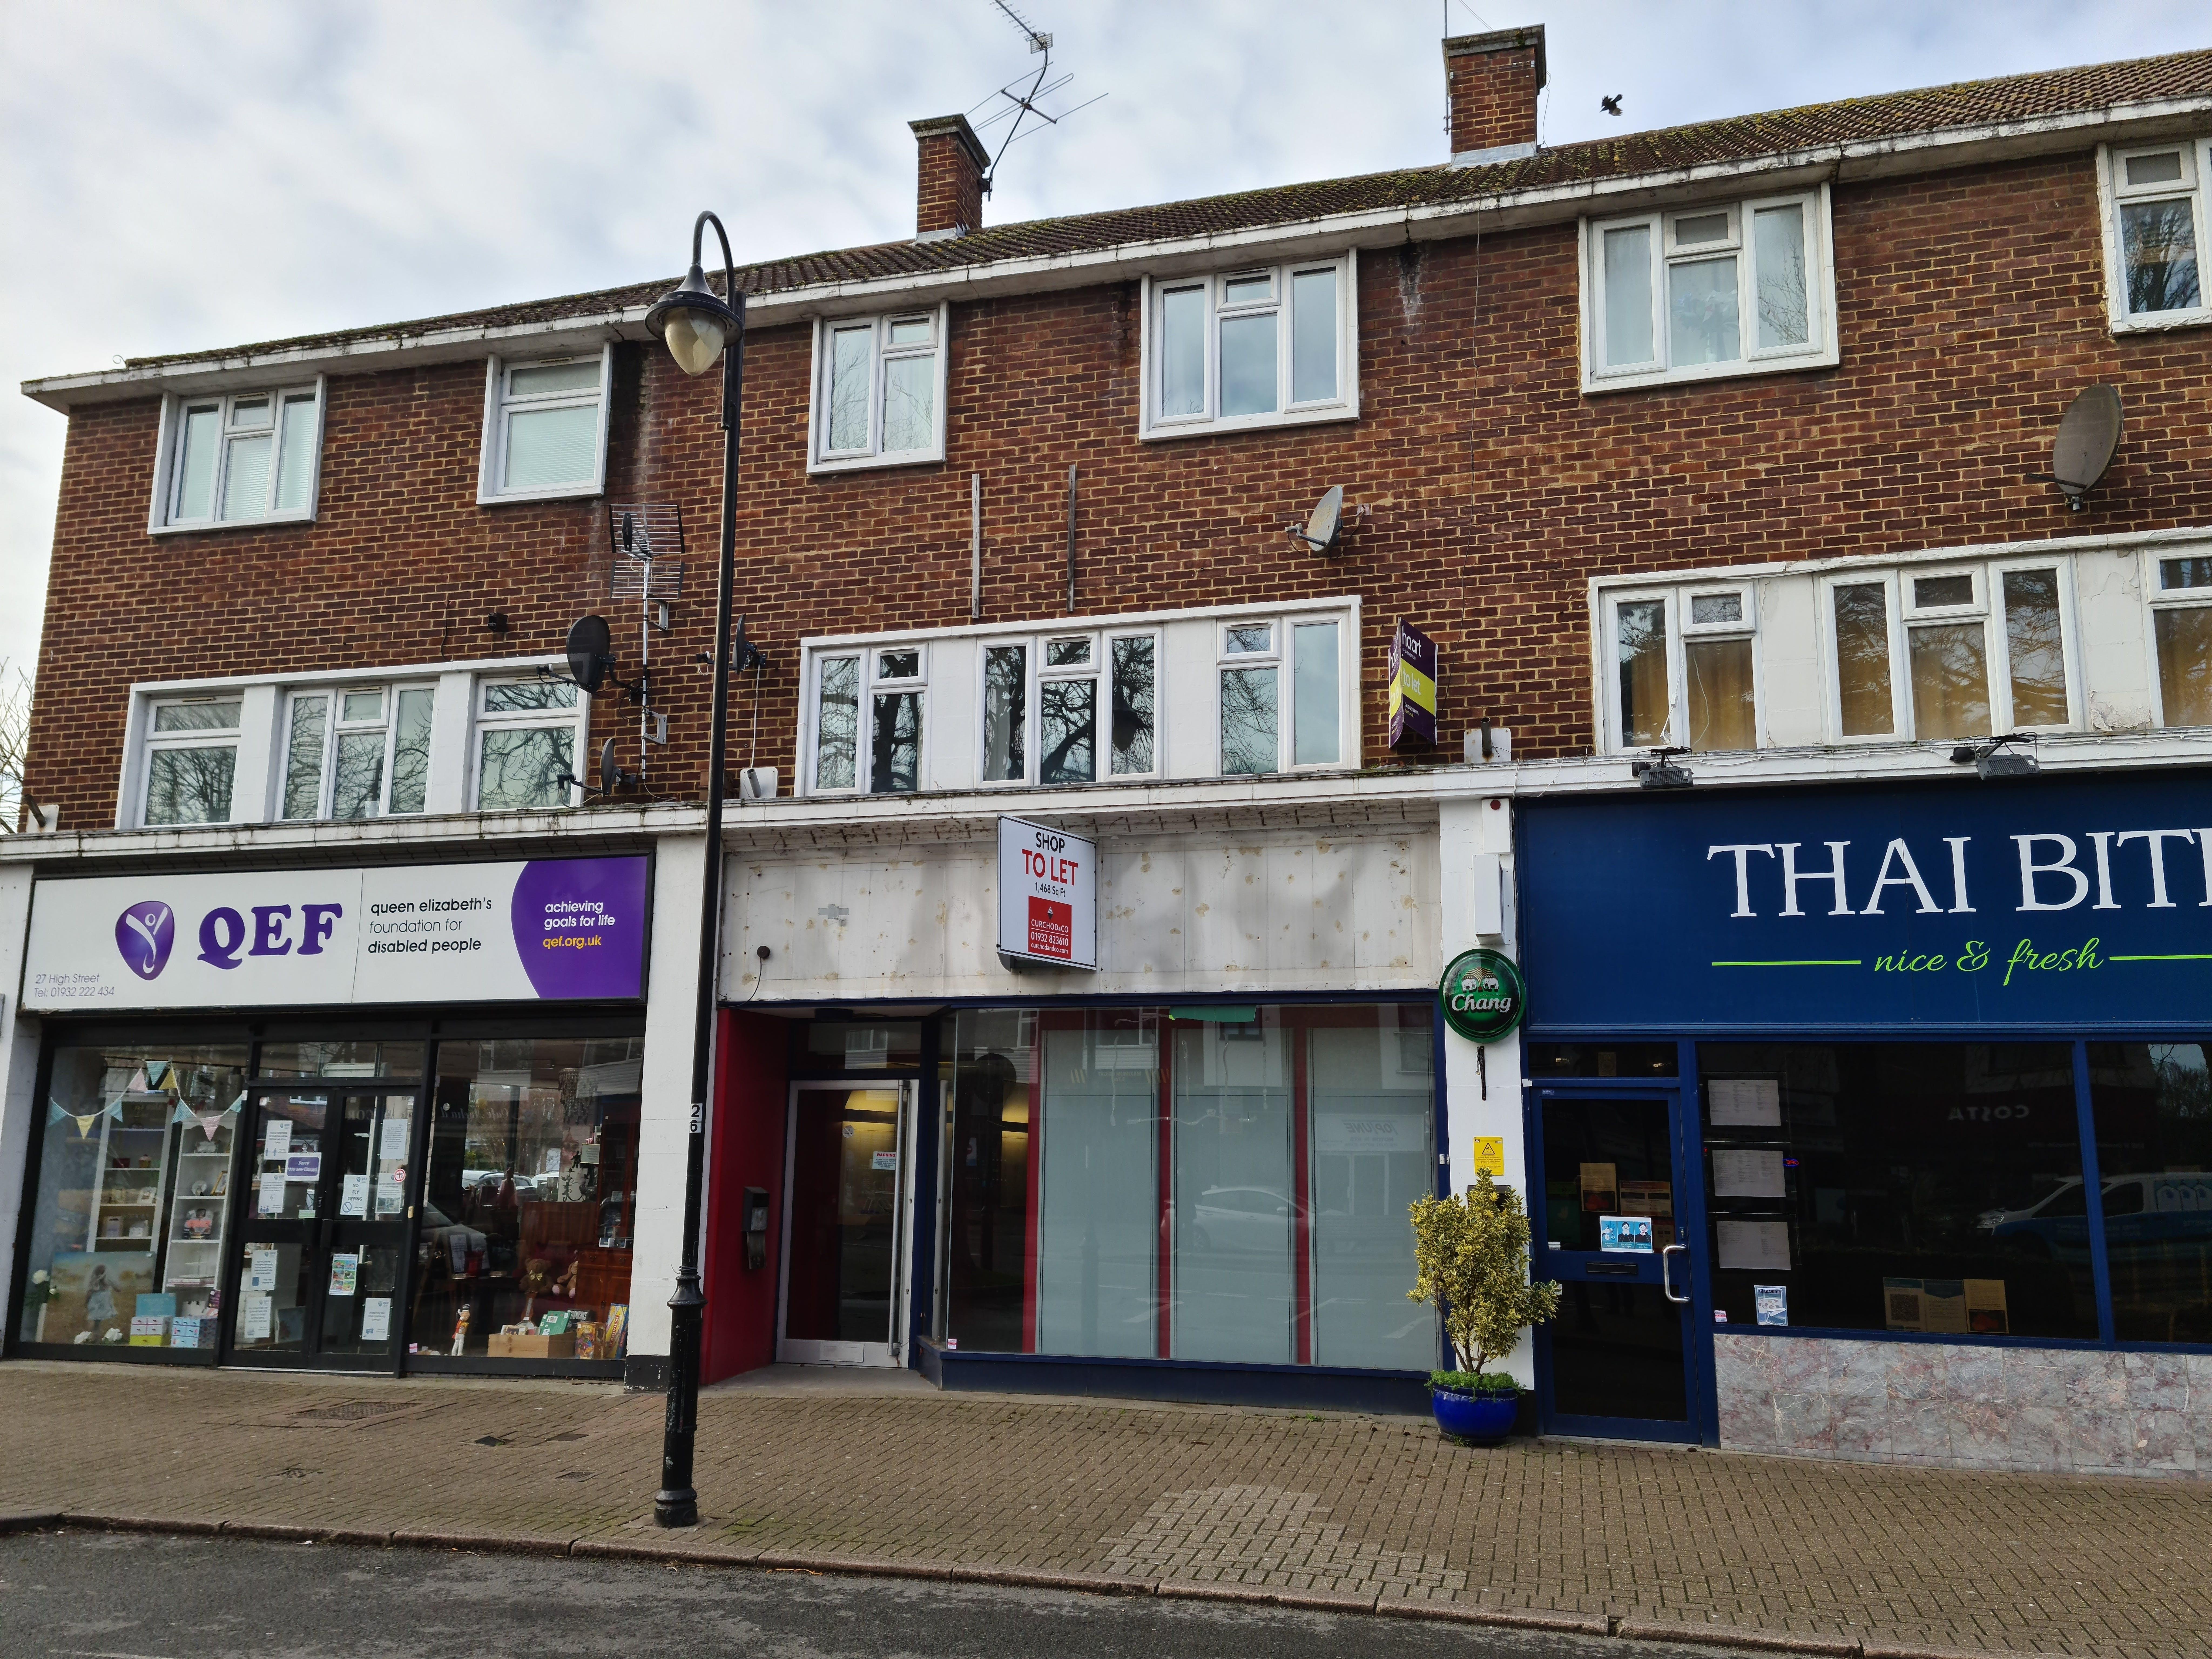 Ground Floor Retail Unit, 25 High Street, Shepperton, Retail To Let - 20210121_110756.jpg